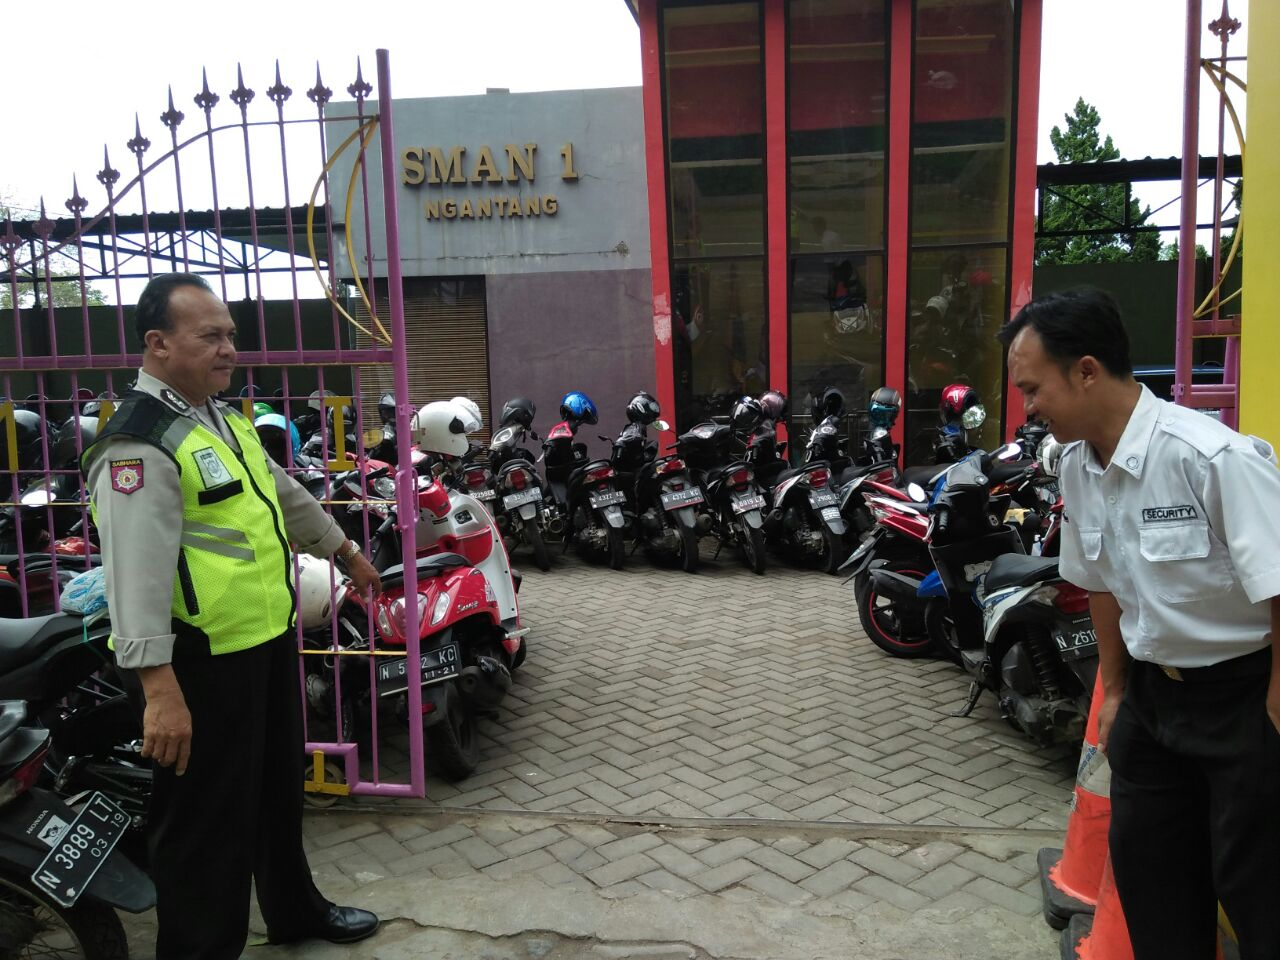 Anggota Polsek Ngantang Polres Batu Melaksanakan Giat Patroli Dialogis Tatap Muka bersama Satpam di SMA N 01 Ngantang